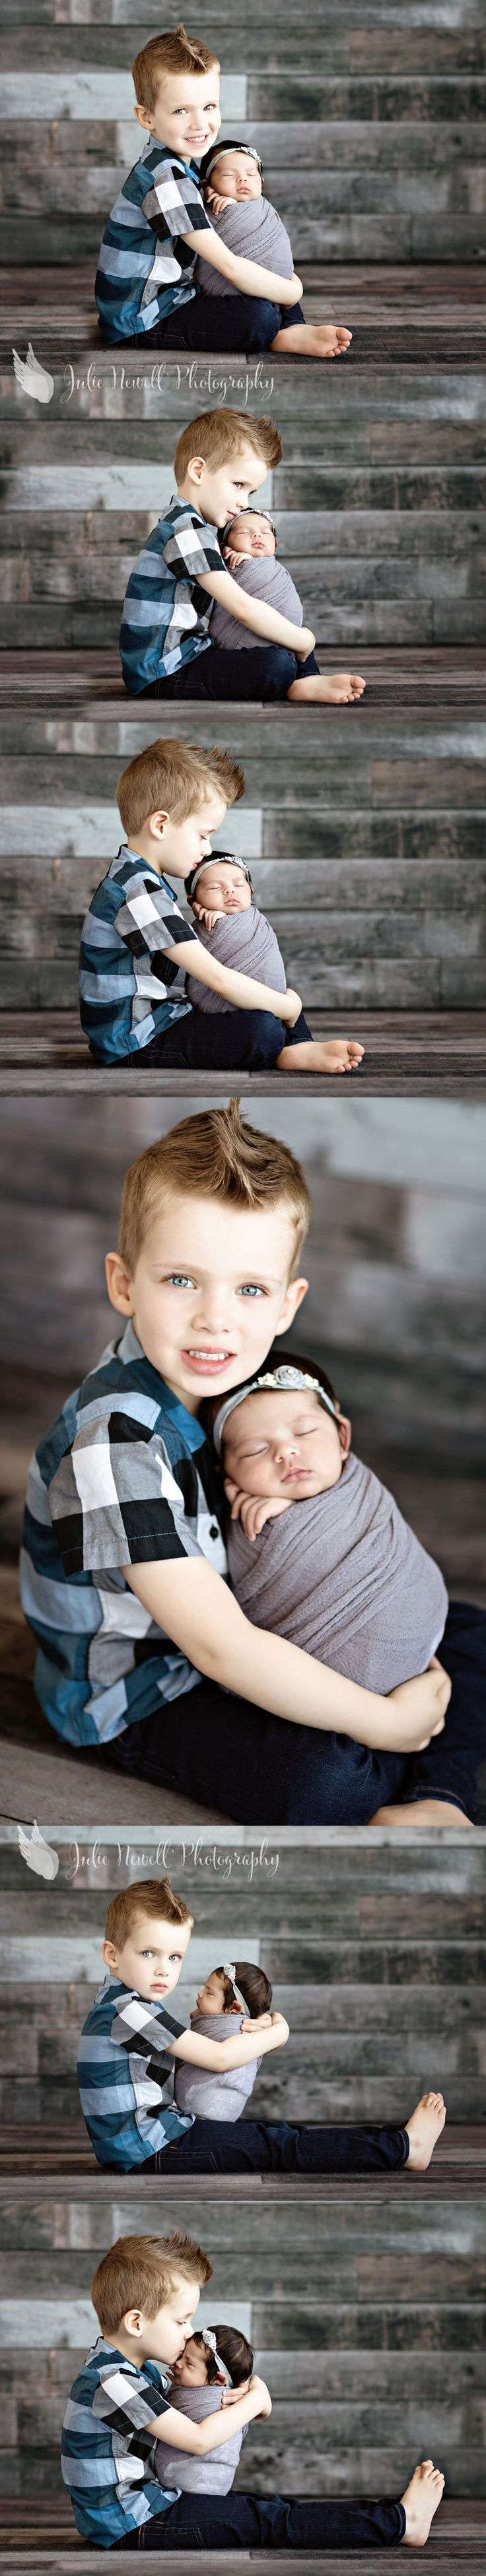 newborn photographer, newborn photography, chicago newborn photographer, chicago newborn photography, newborn and sibling photography, newborn and sibling photographer